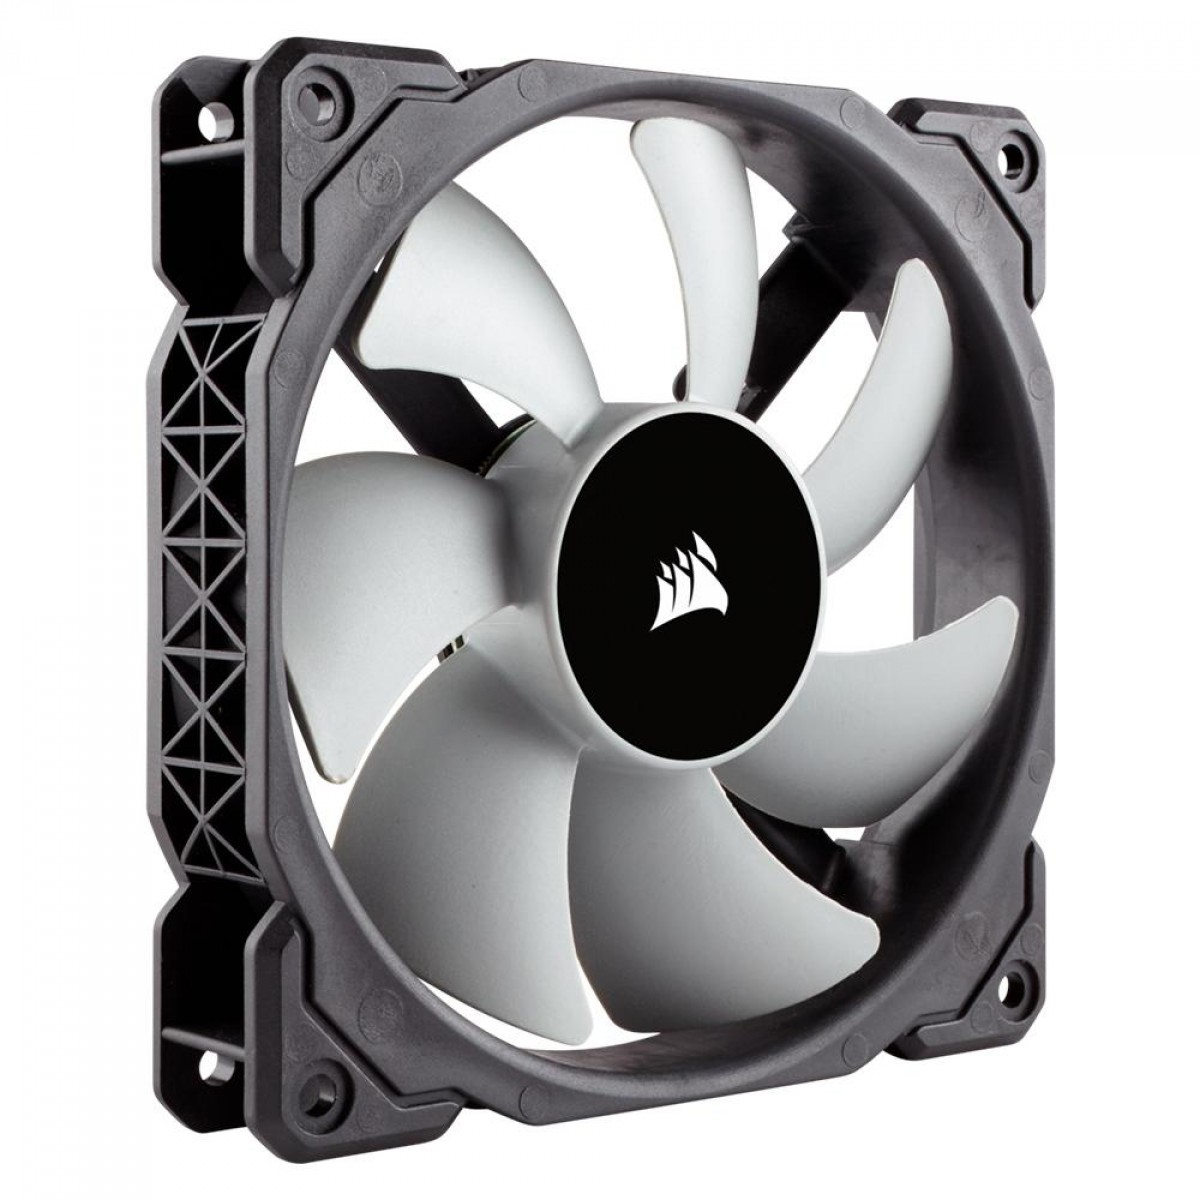 Cooler para Gabinete Corsair ML120 Premium, 120mm, CO-9050049-WW